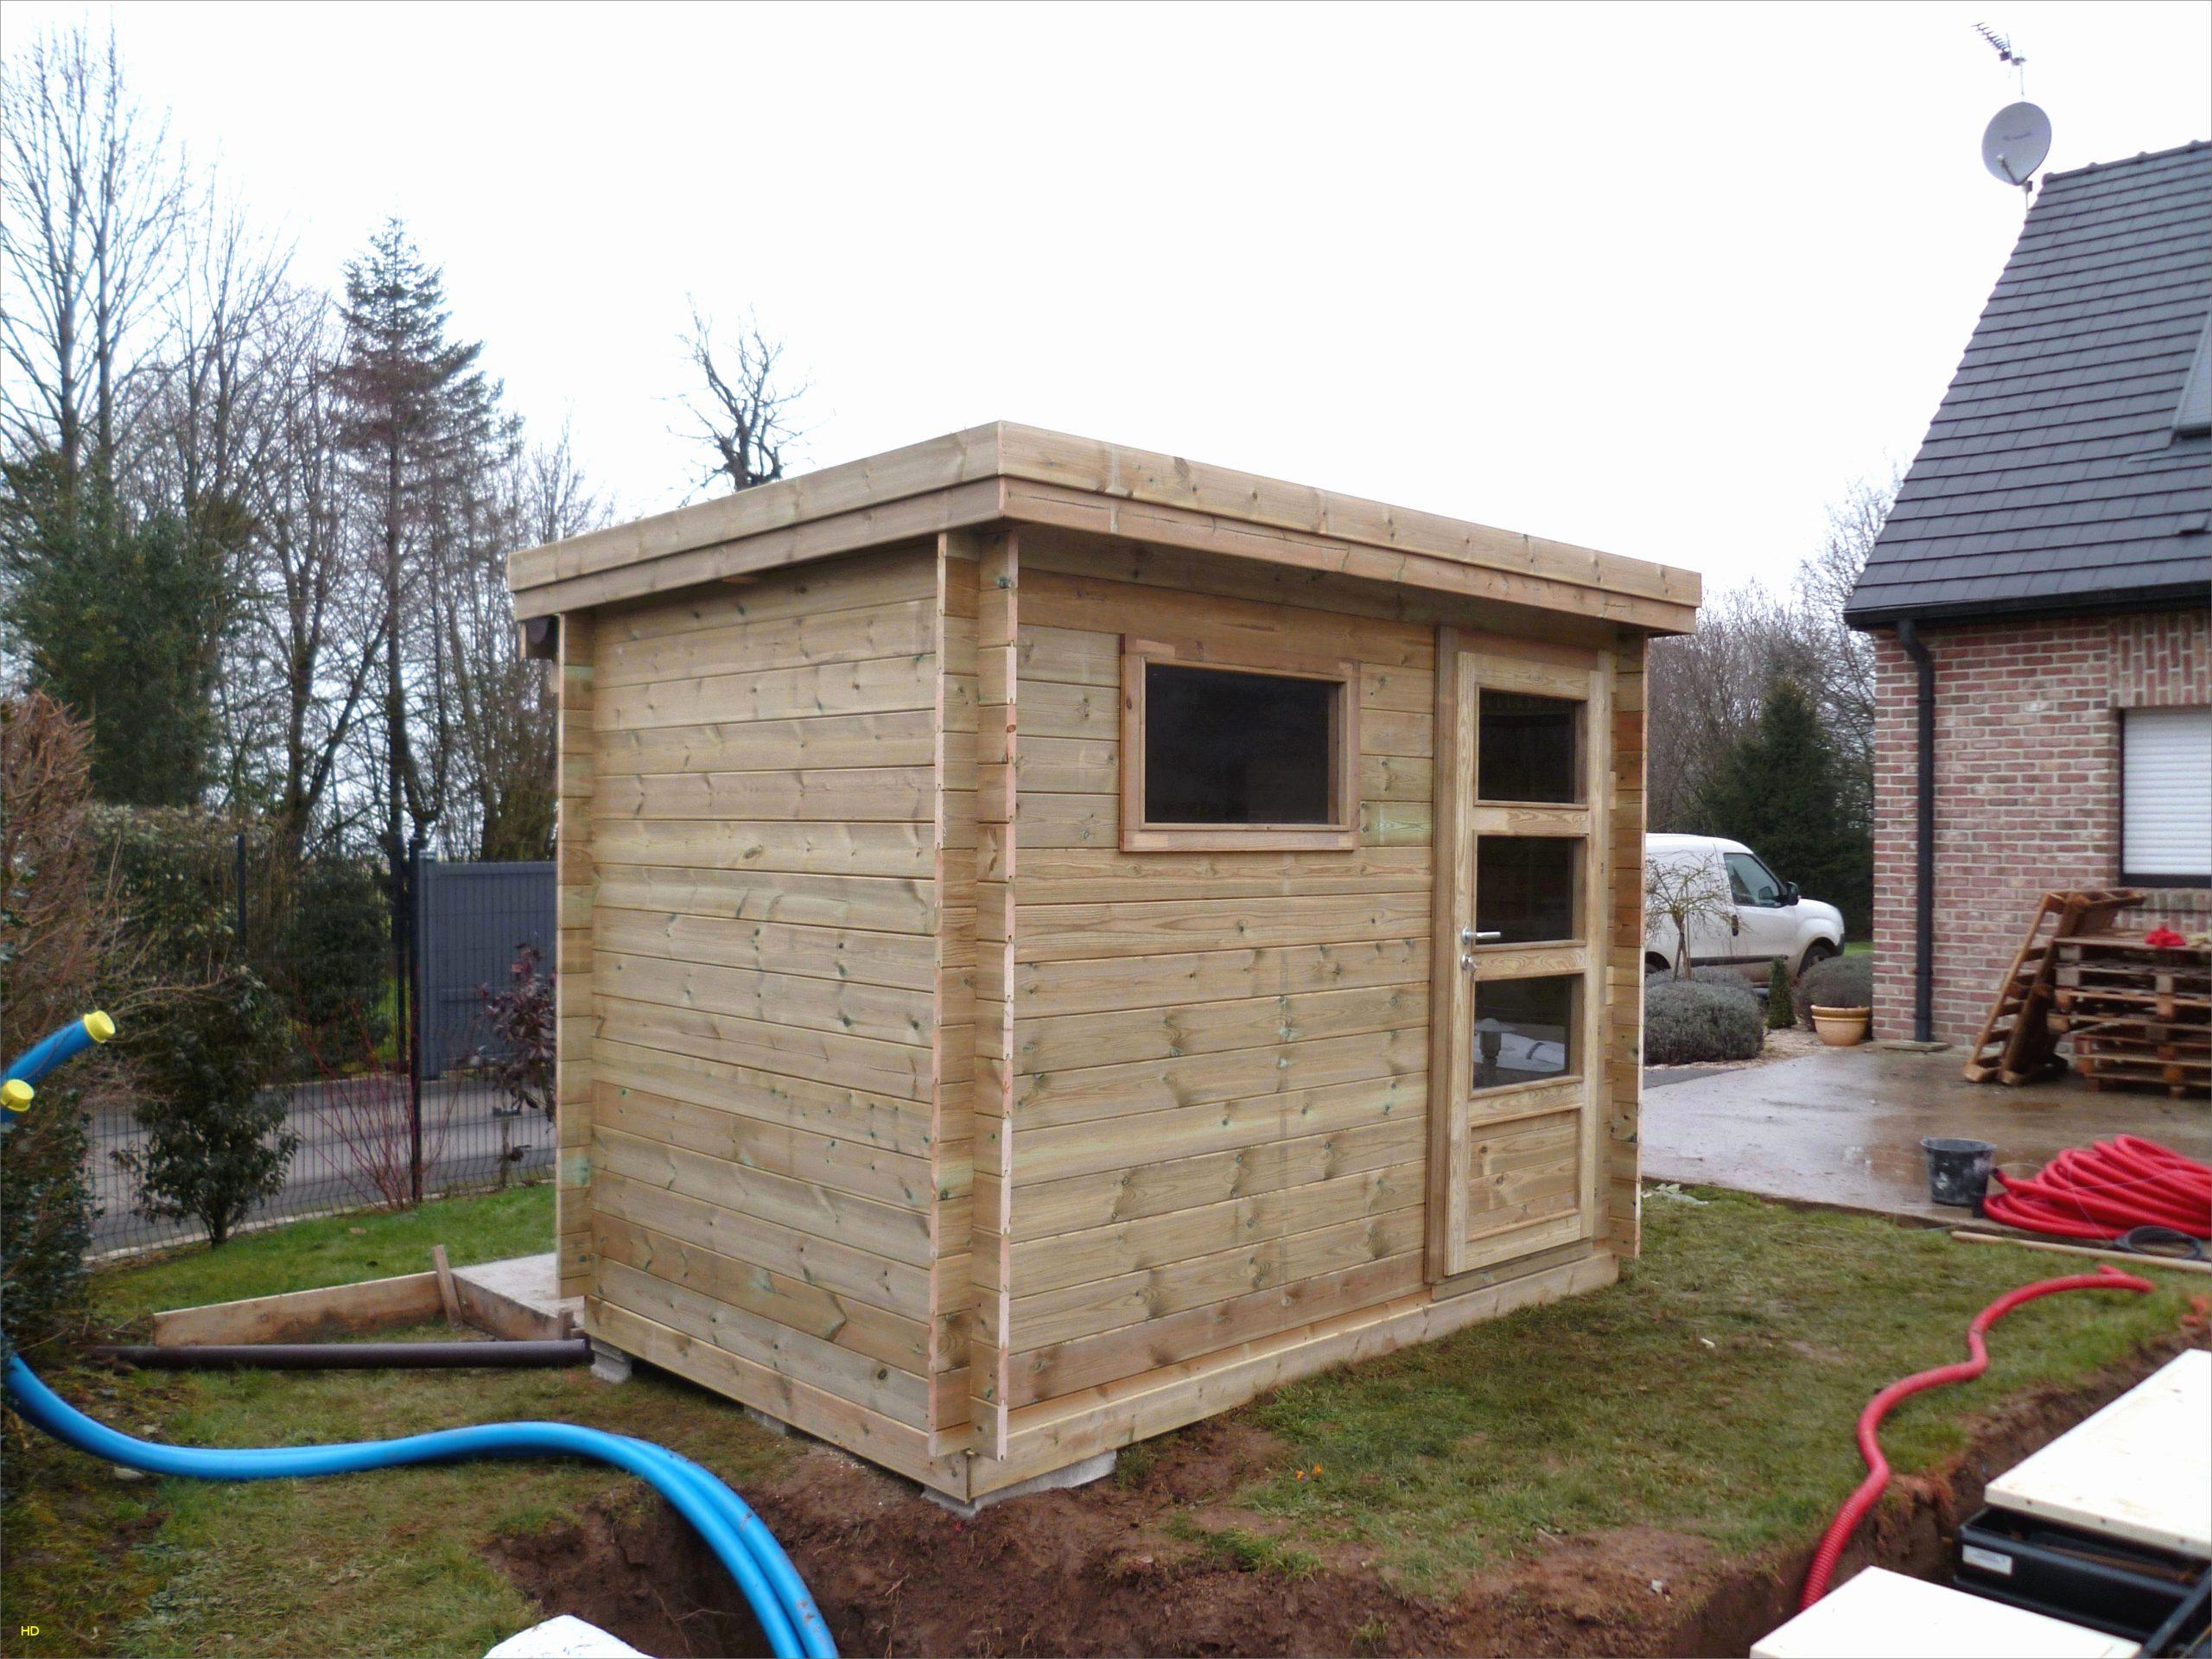 Abri Jacuzzi Bois | Enredada dedans Construire Une Cabane De Jardin